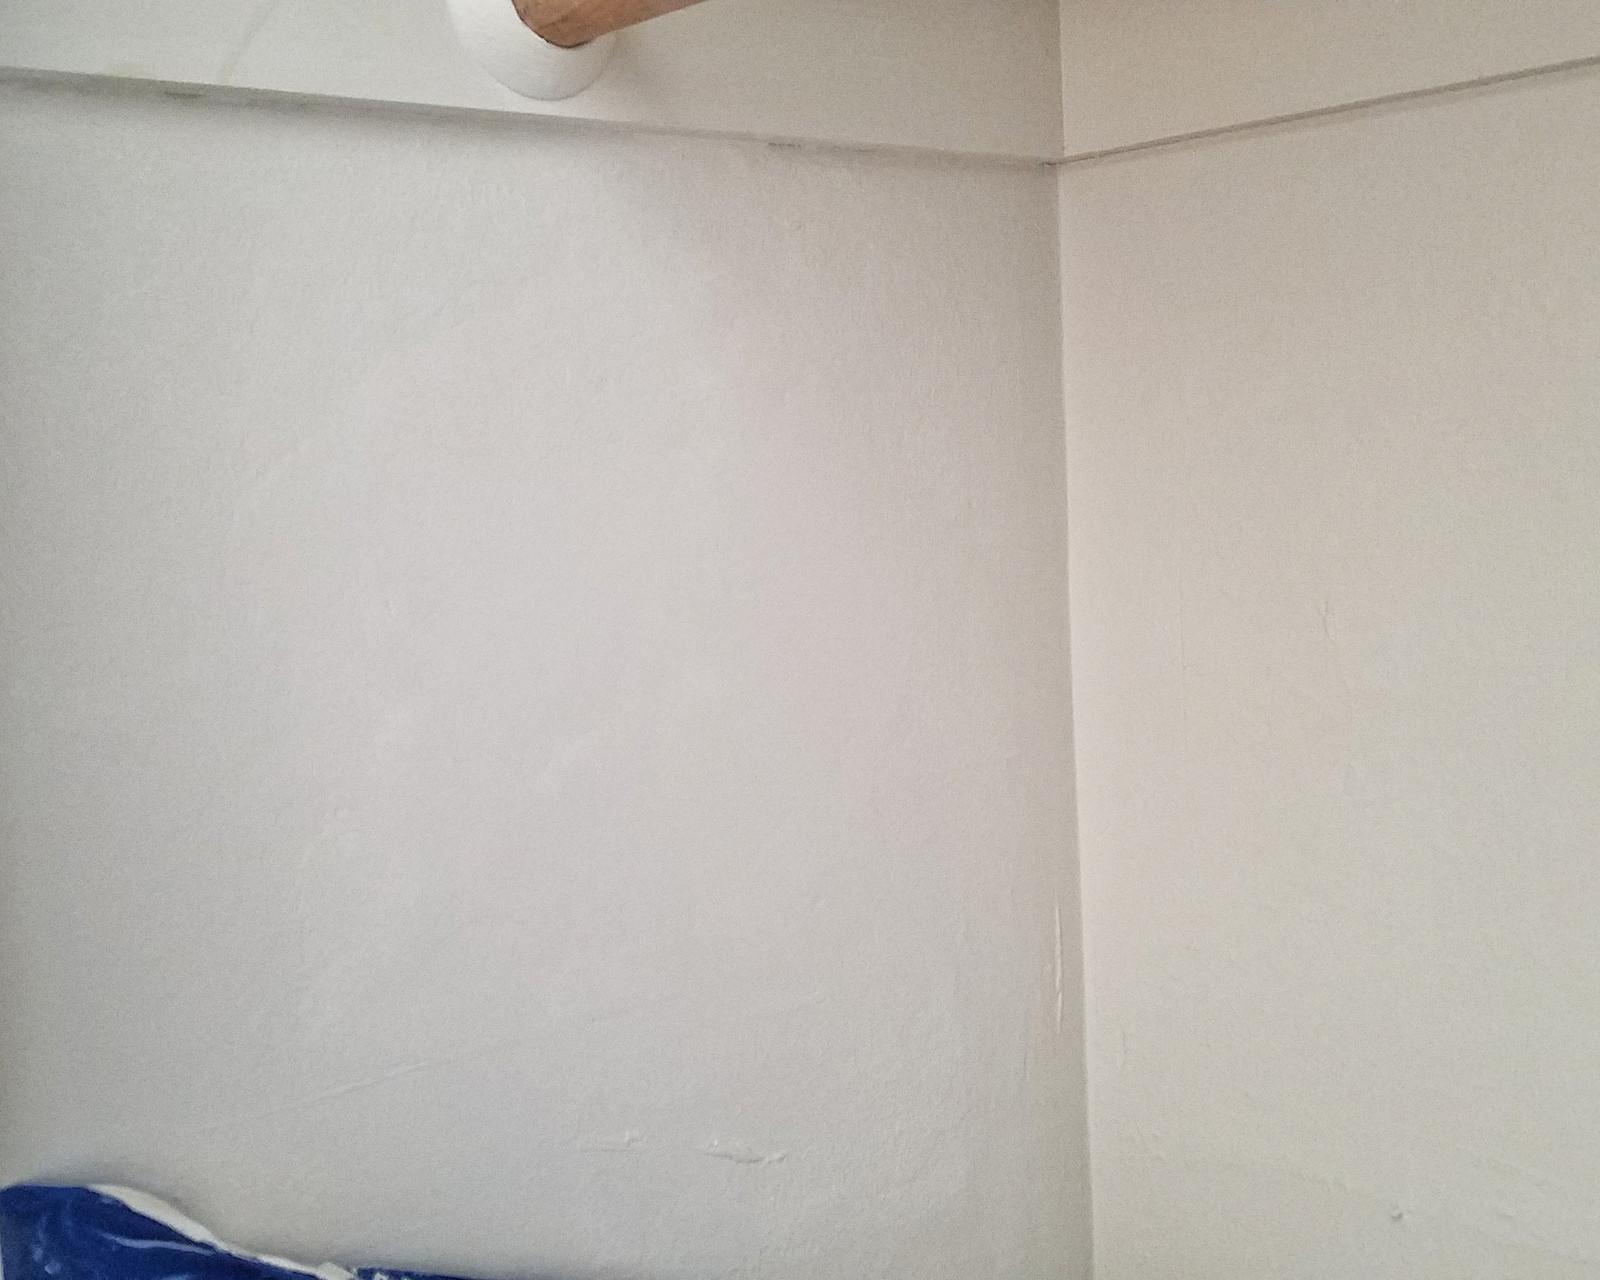 Gottaguy Handyman Services Drywall Repair In Oakmont